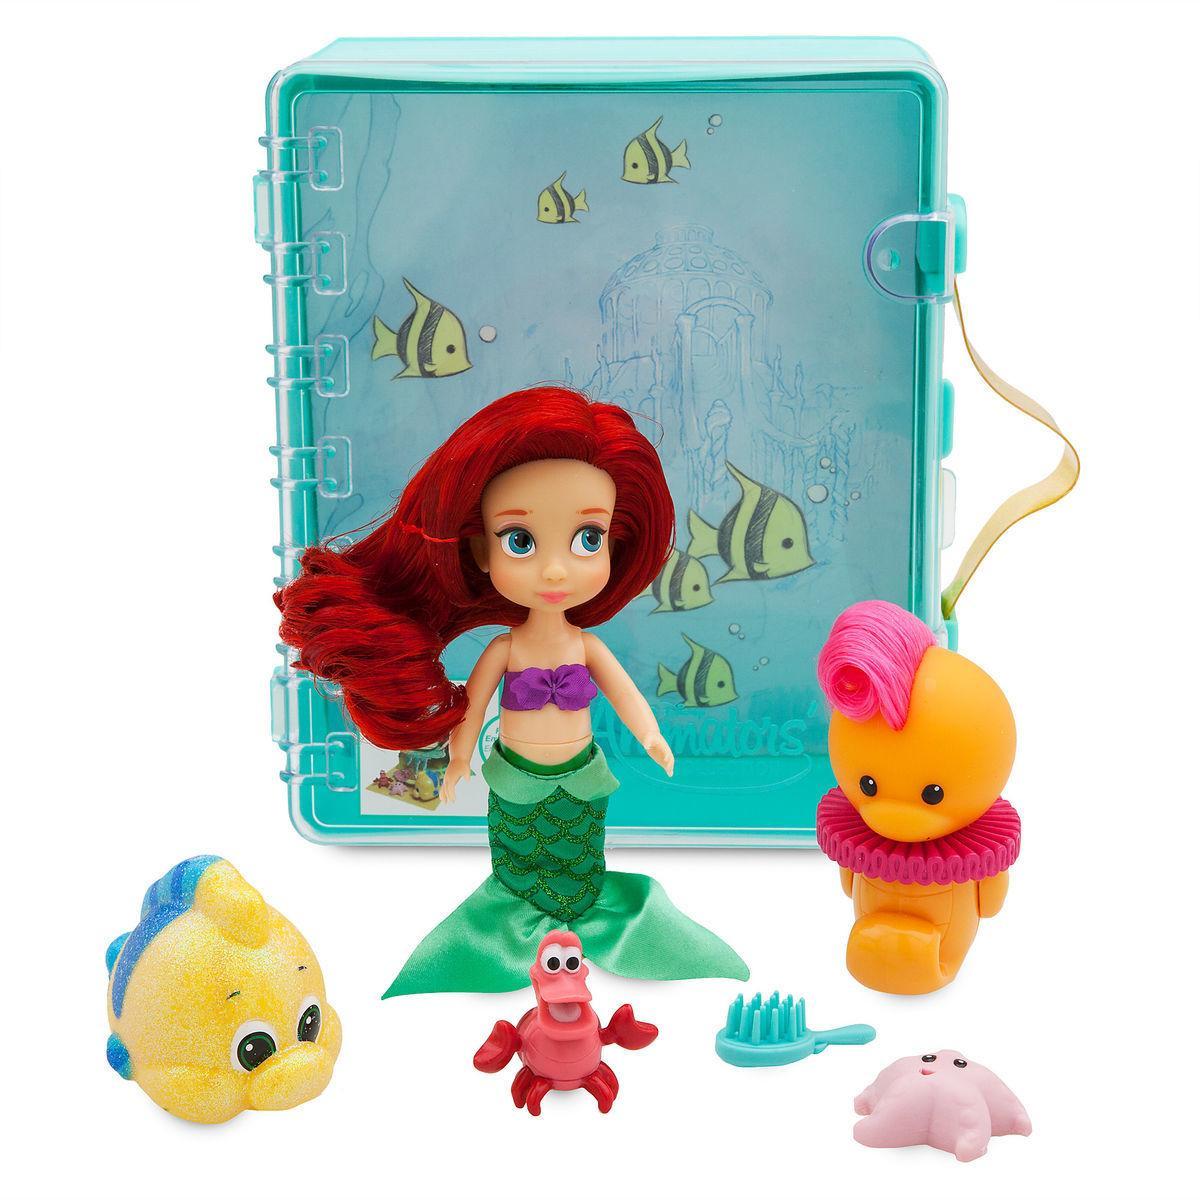 Набор Disney Animators мини кукла принцесса Ариэль - Русалочка